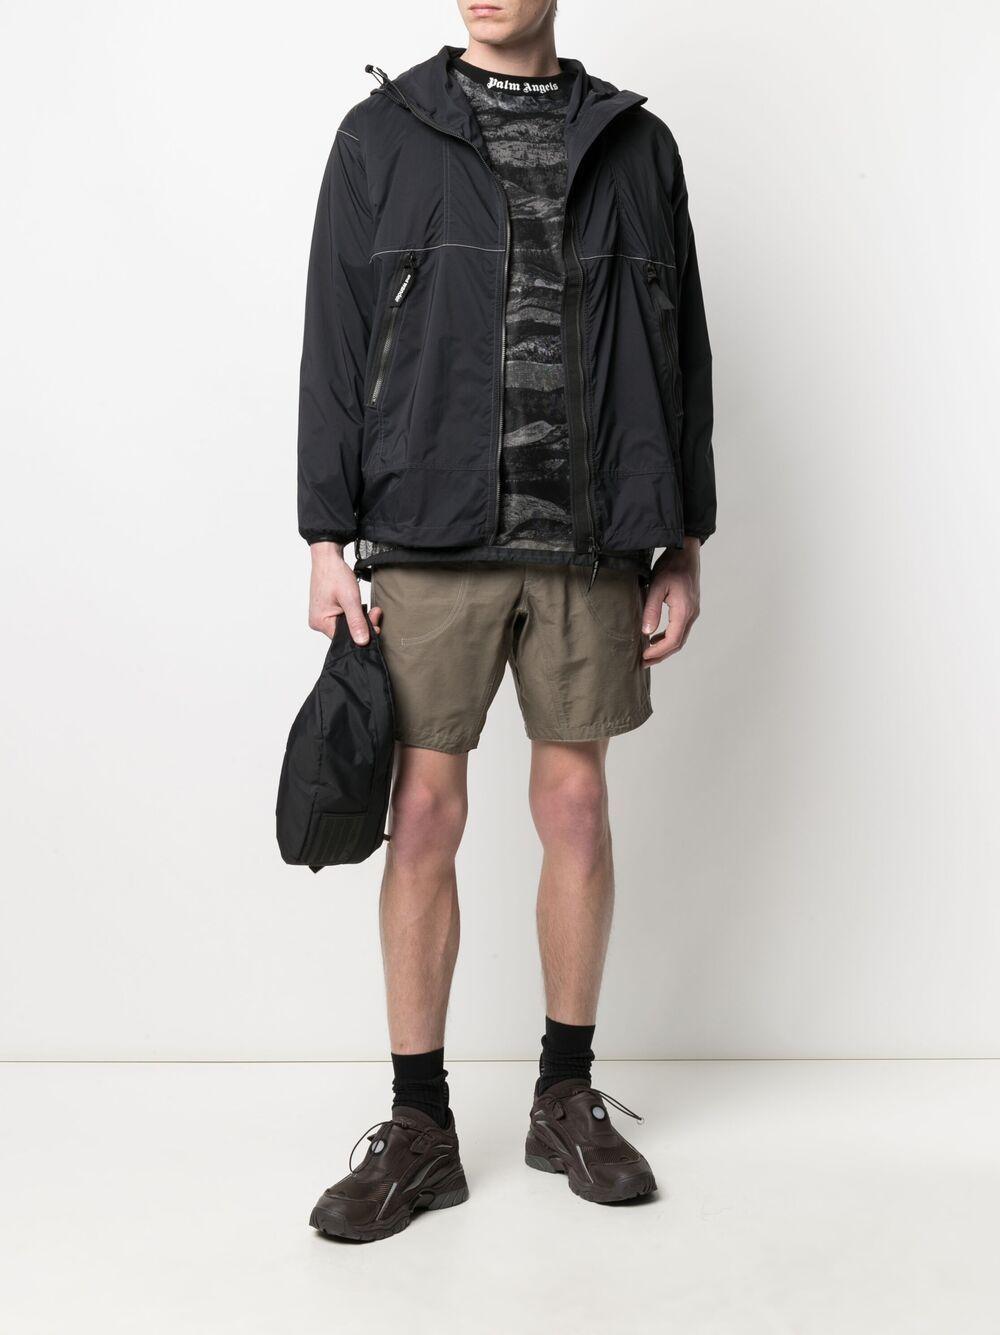 And Wander giacca leggera con stampa logo uomo nero AND WANDER | Giacche | 5740921034010